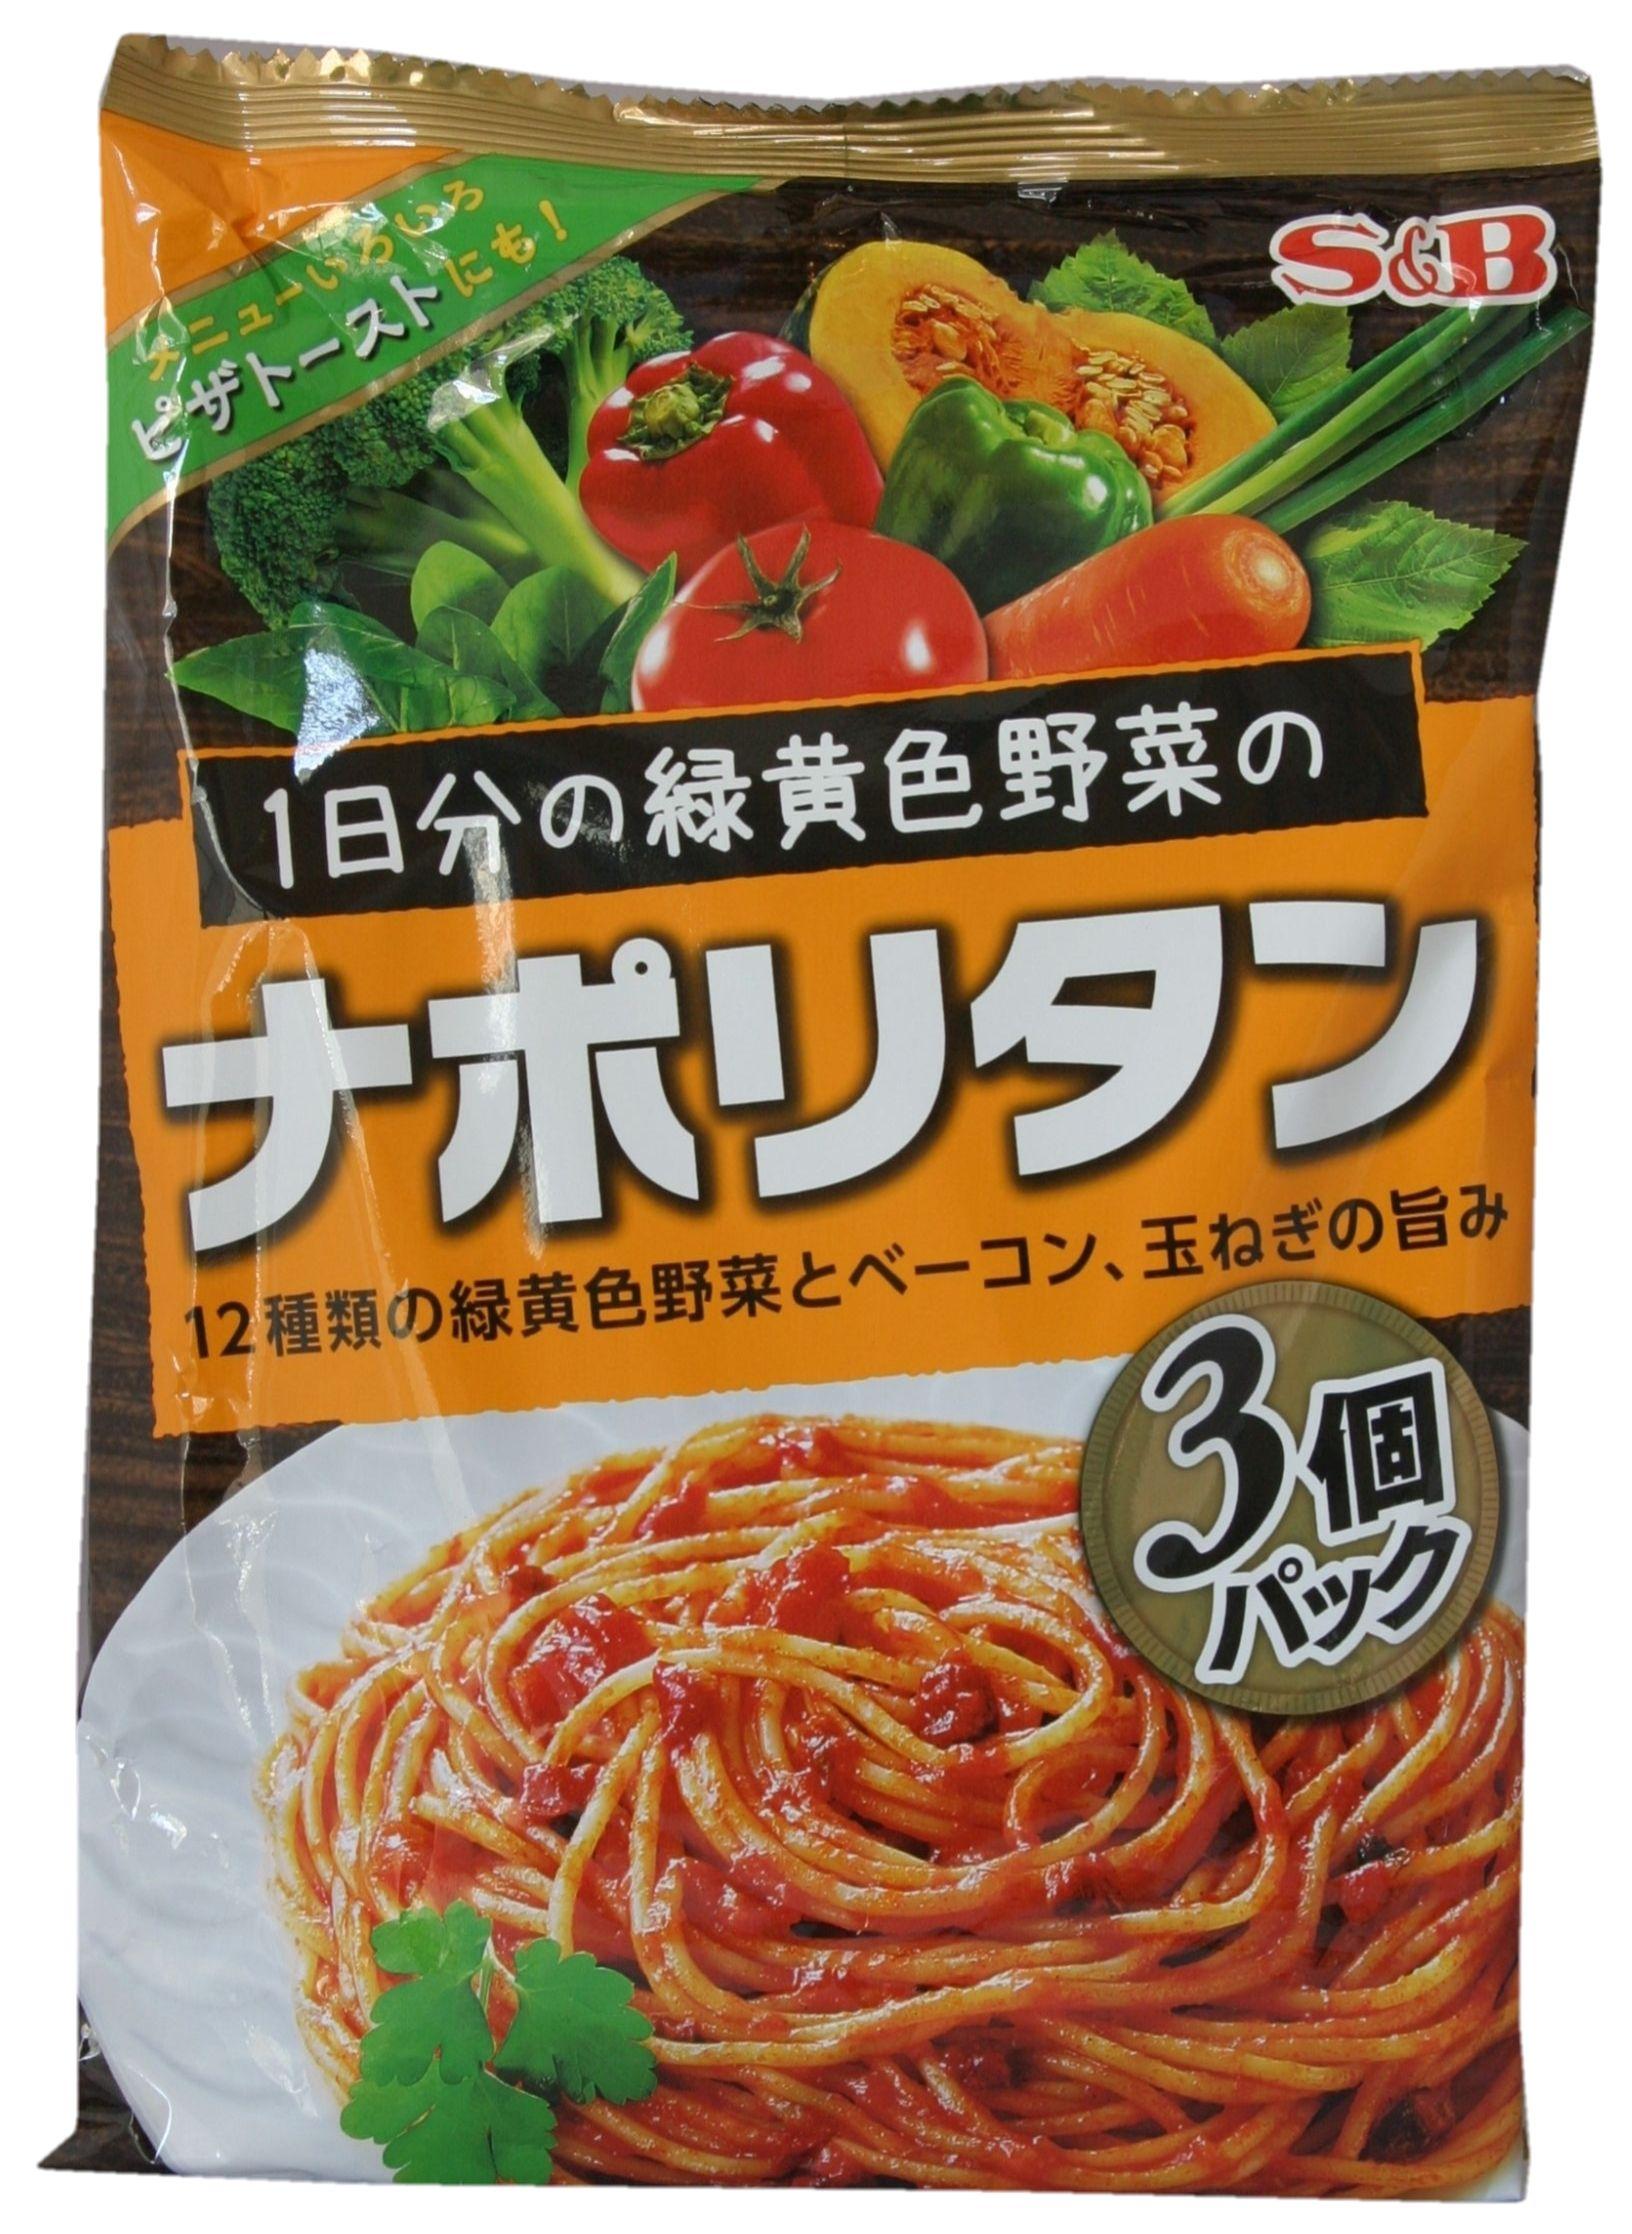 S&B pasta sauce